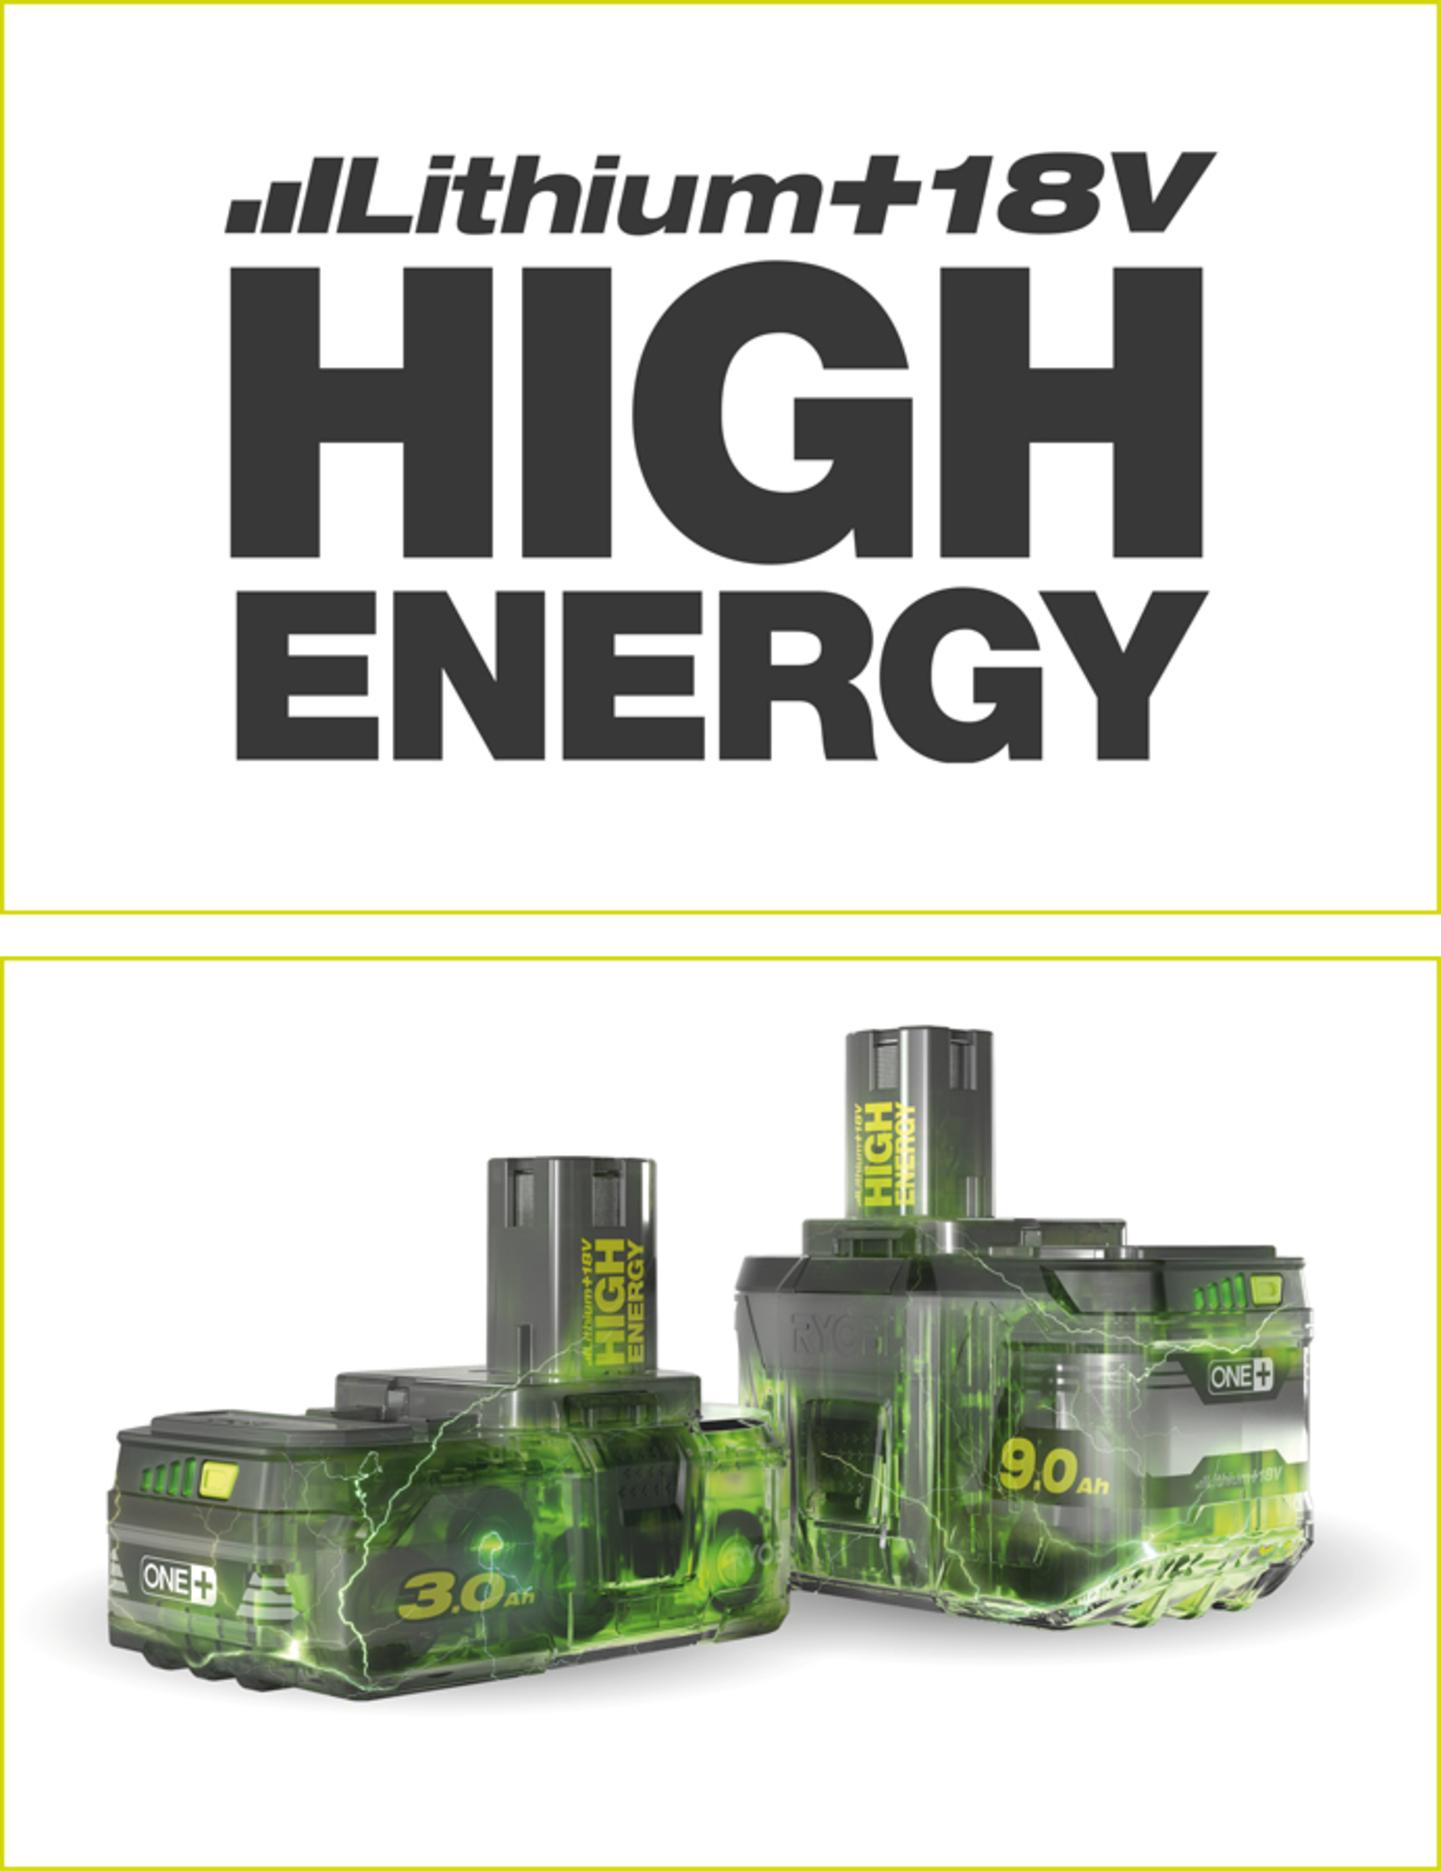 Lithium+ High Energy Akkus image